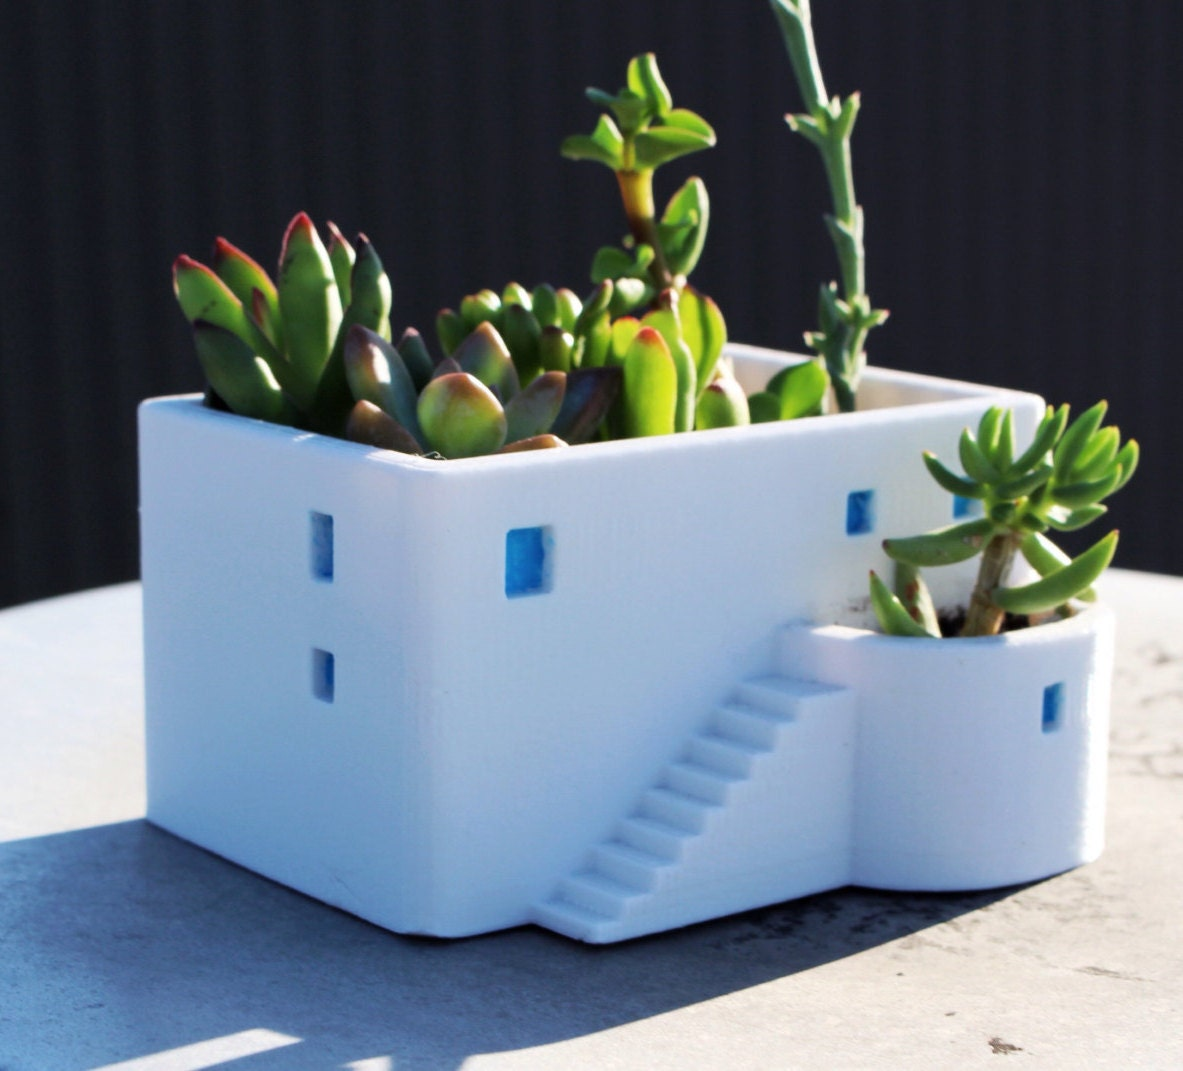 Greek House House Planter, Summer Gift, 3D printed, Miniature, Cute, Office